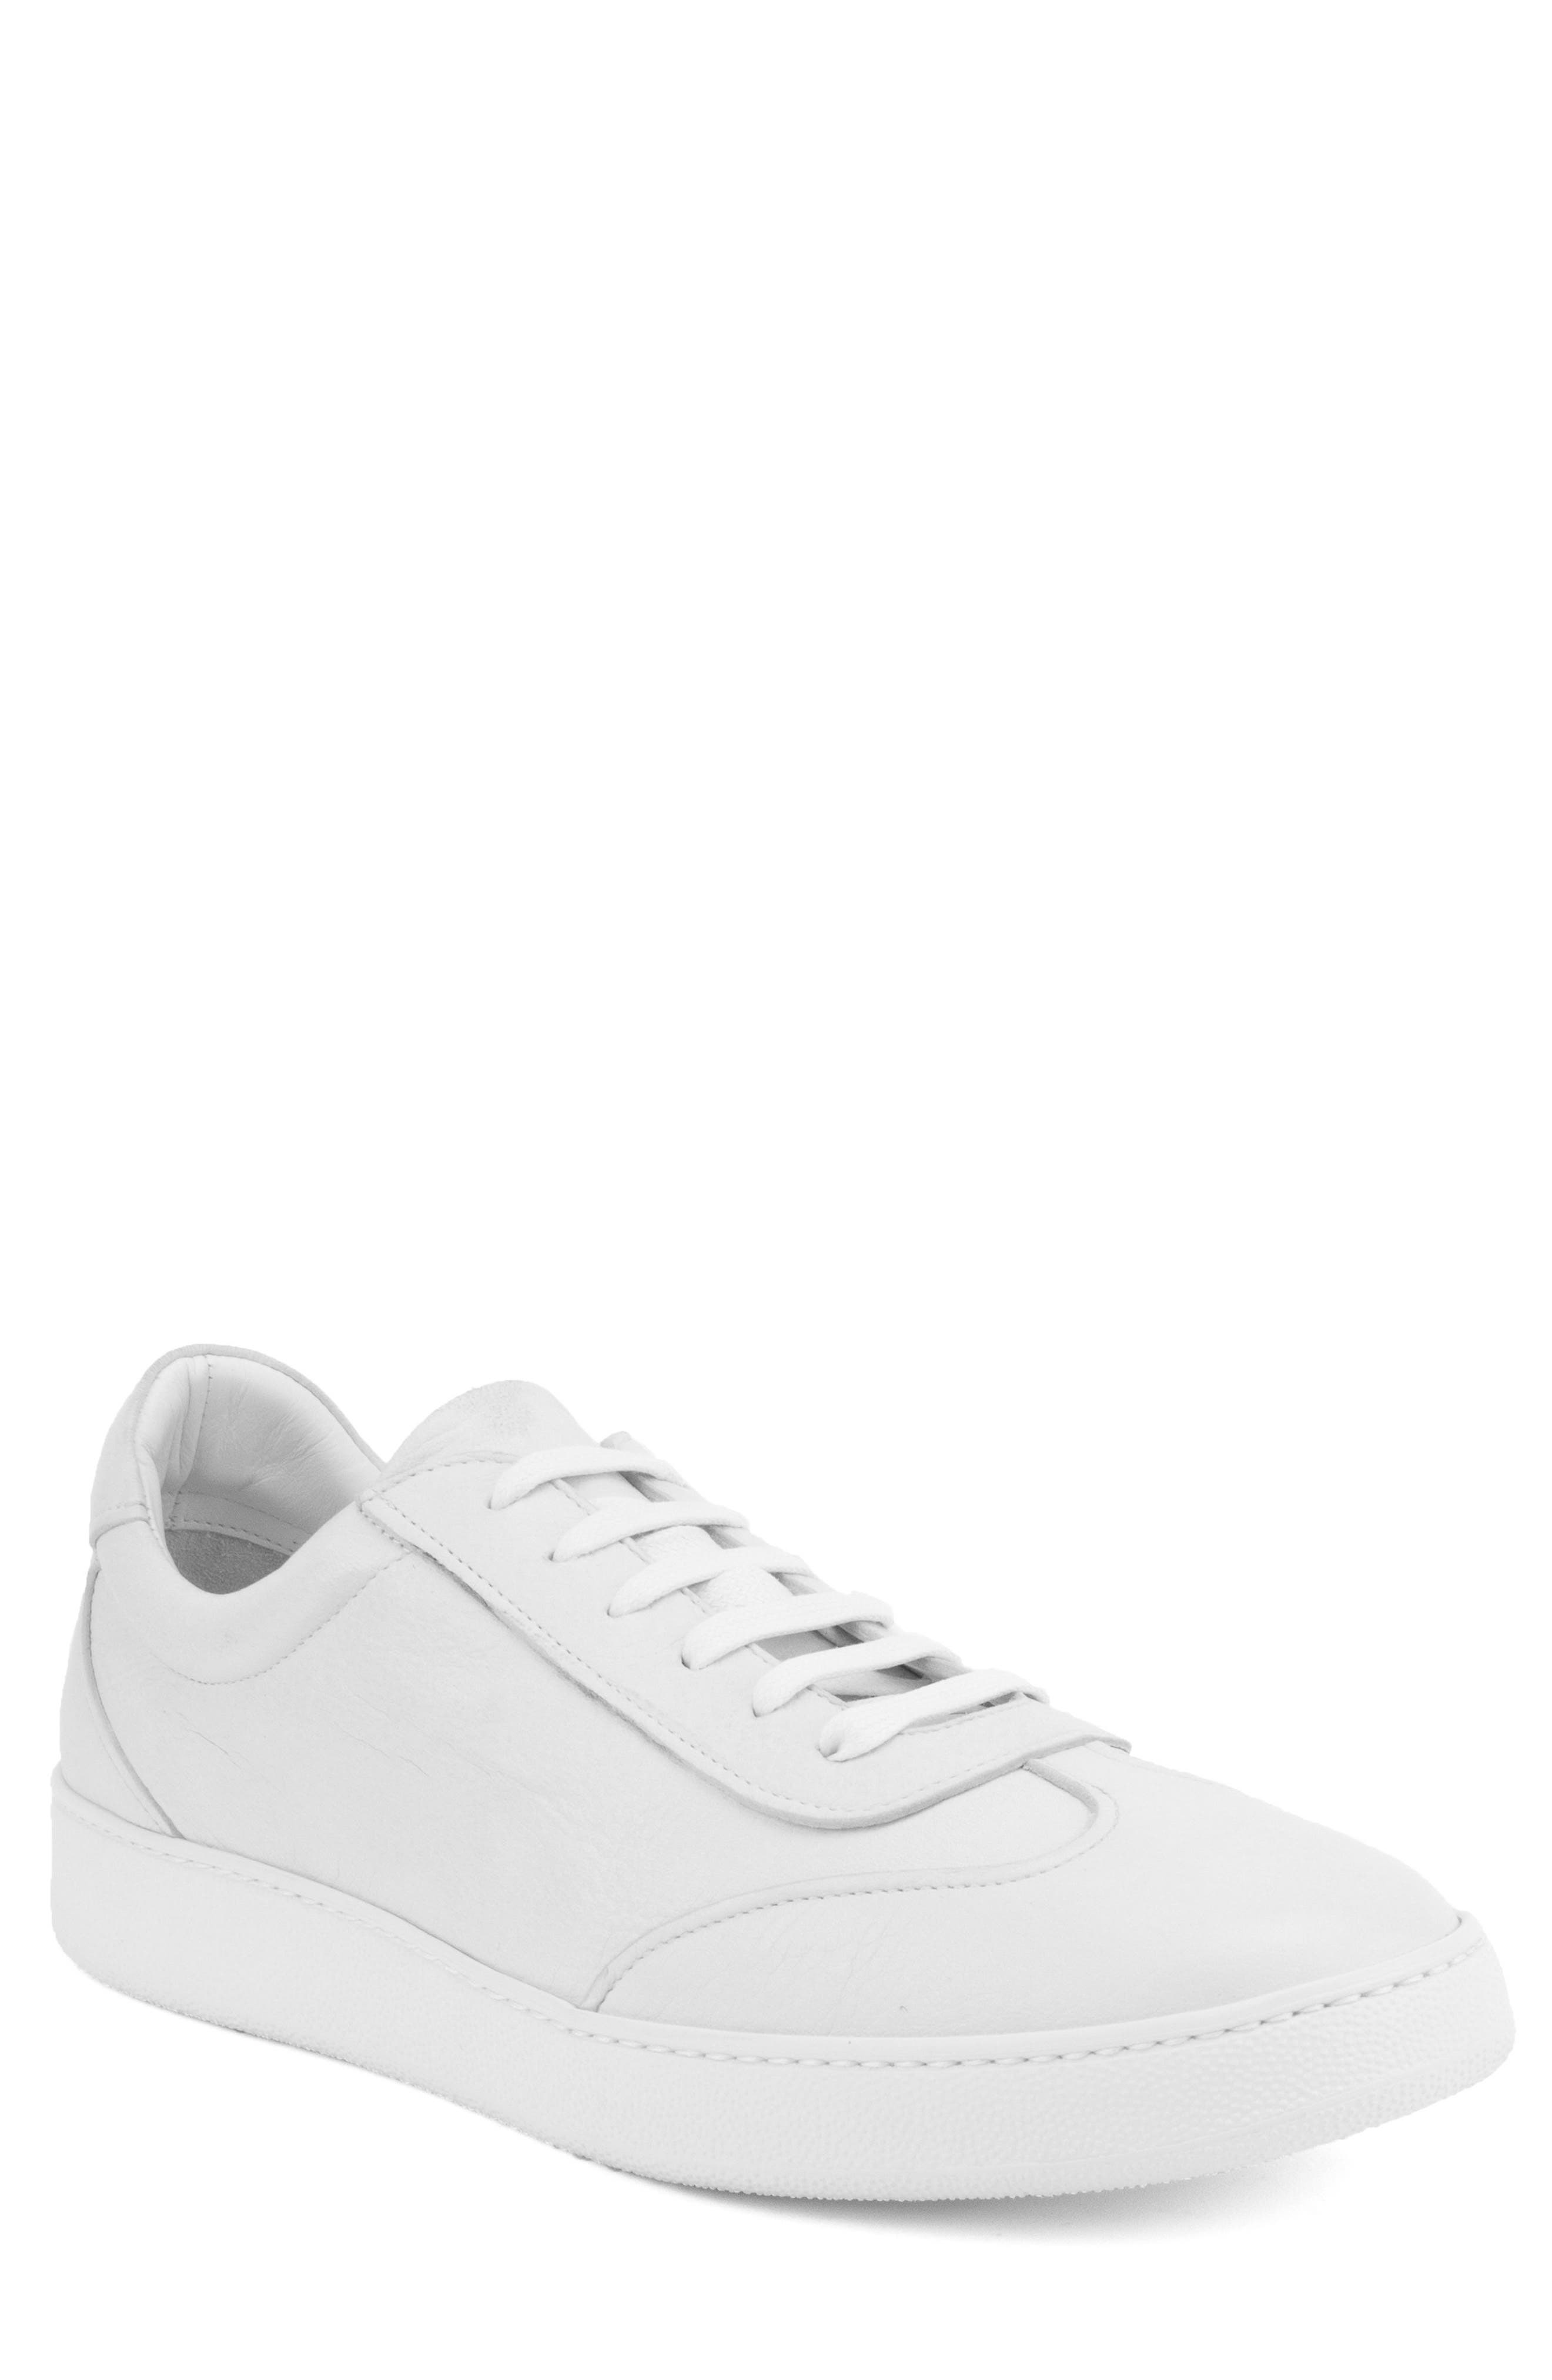 Tristan Sneaker,                             Main thumbnail 1, color,                             WHITE LEATHER